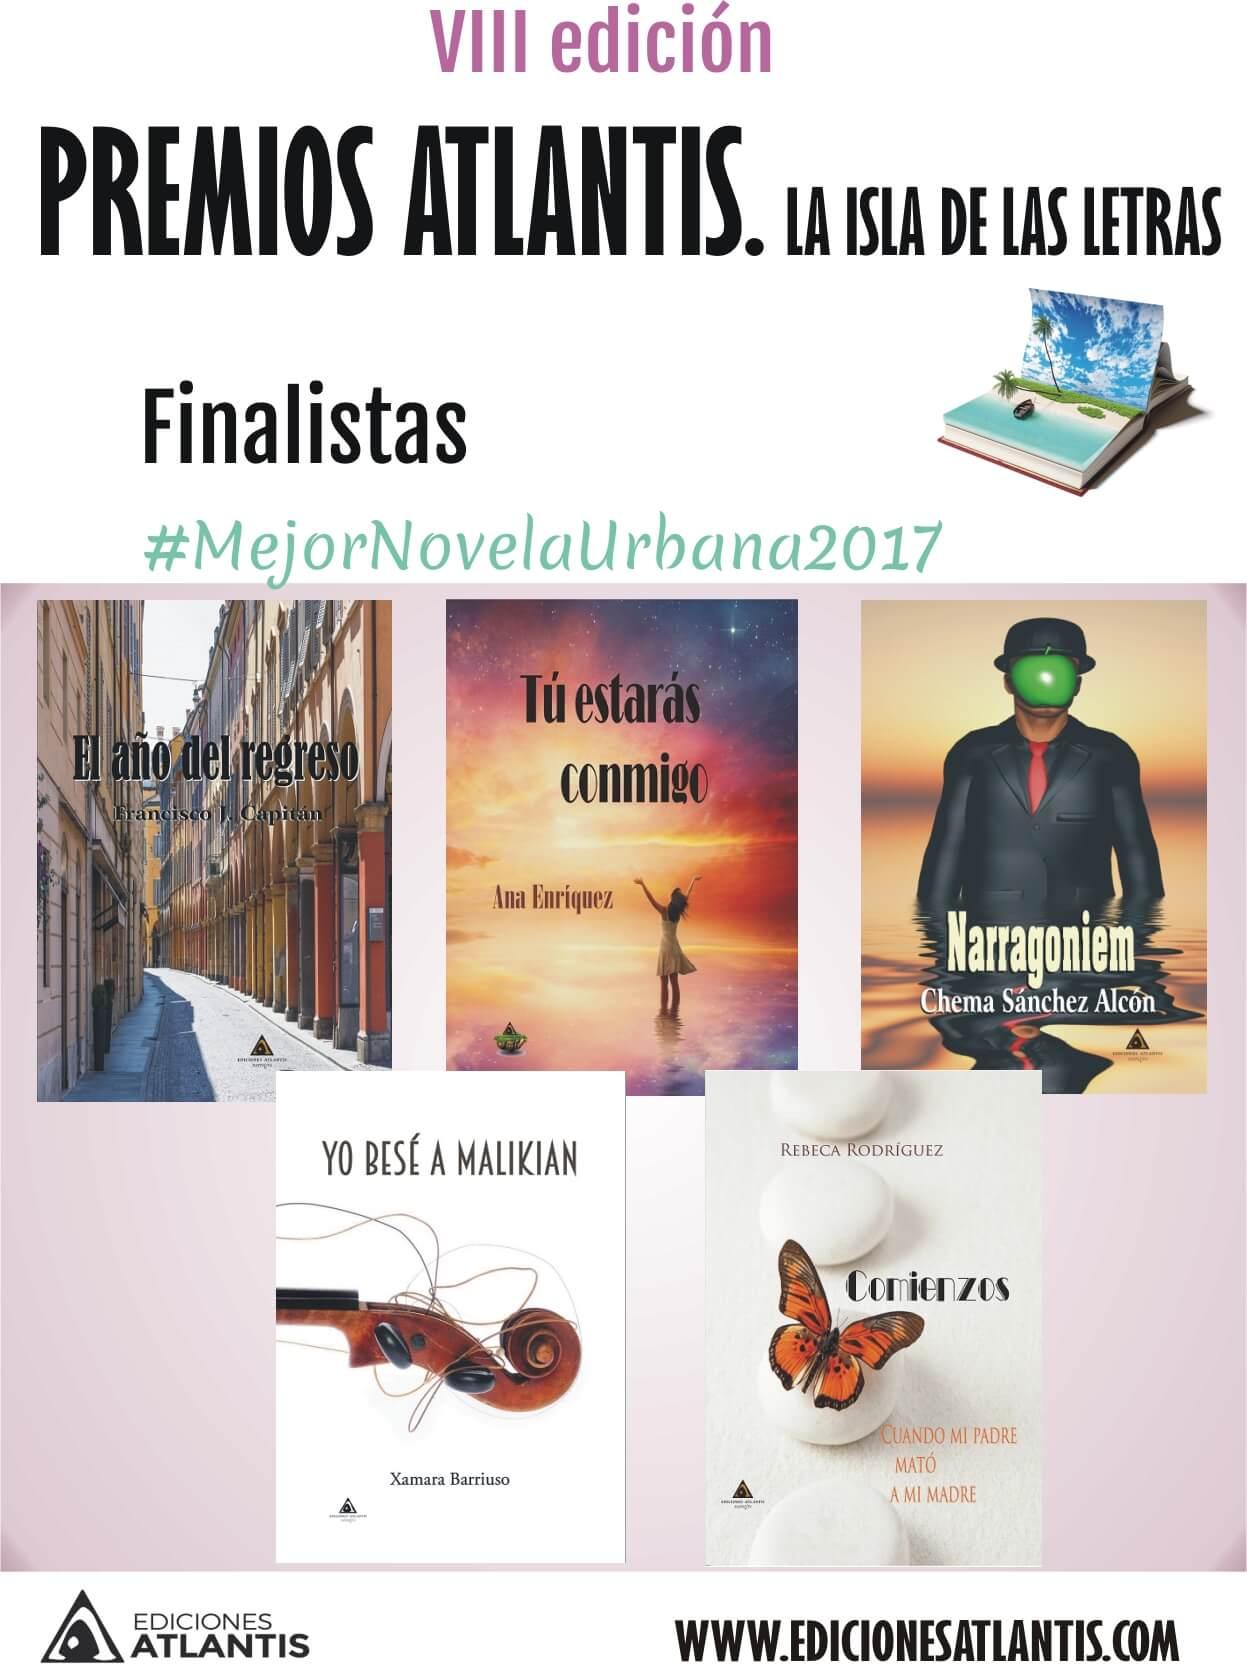 Premios Atlantis. Finalistas a mejor novela urbana